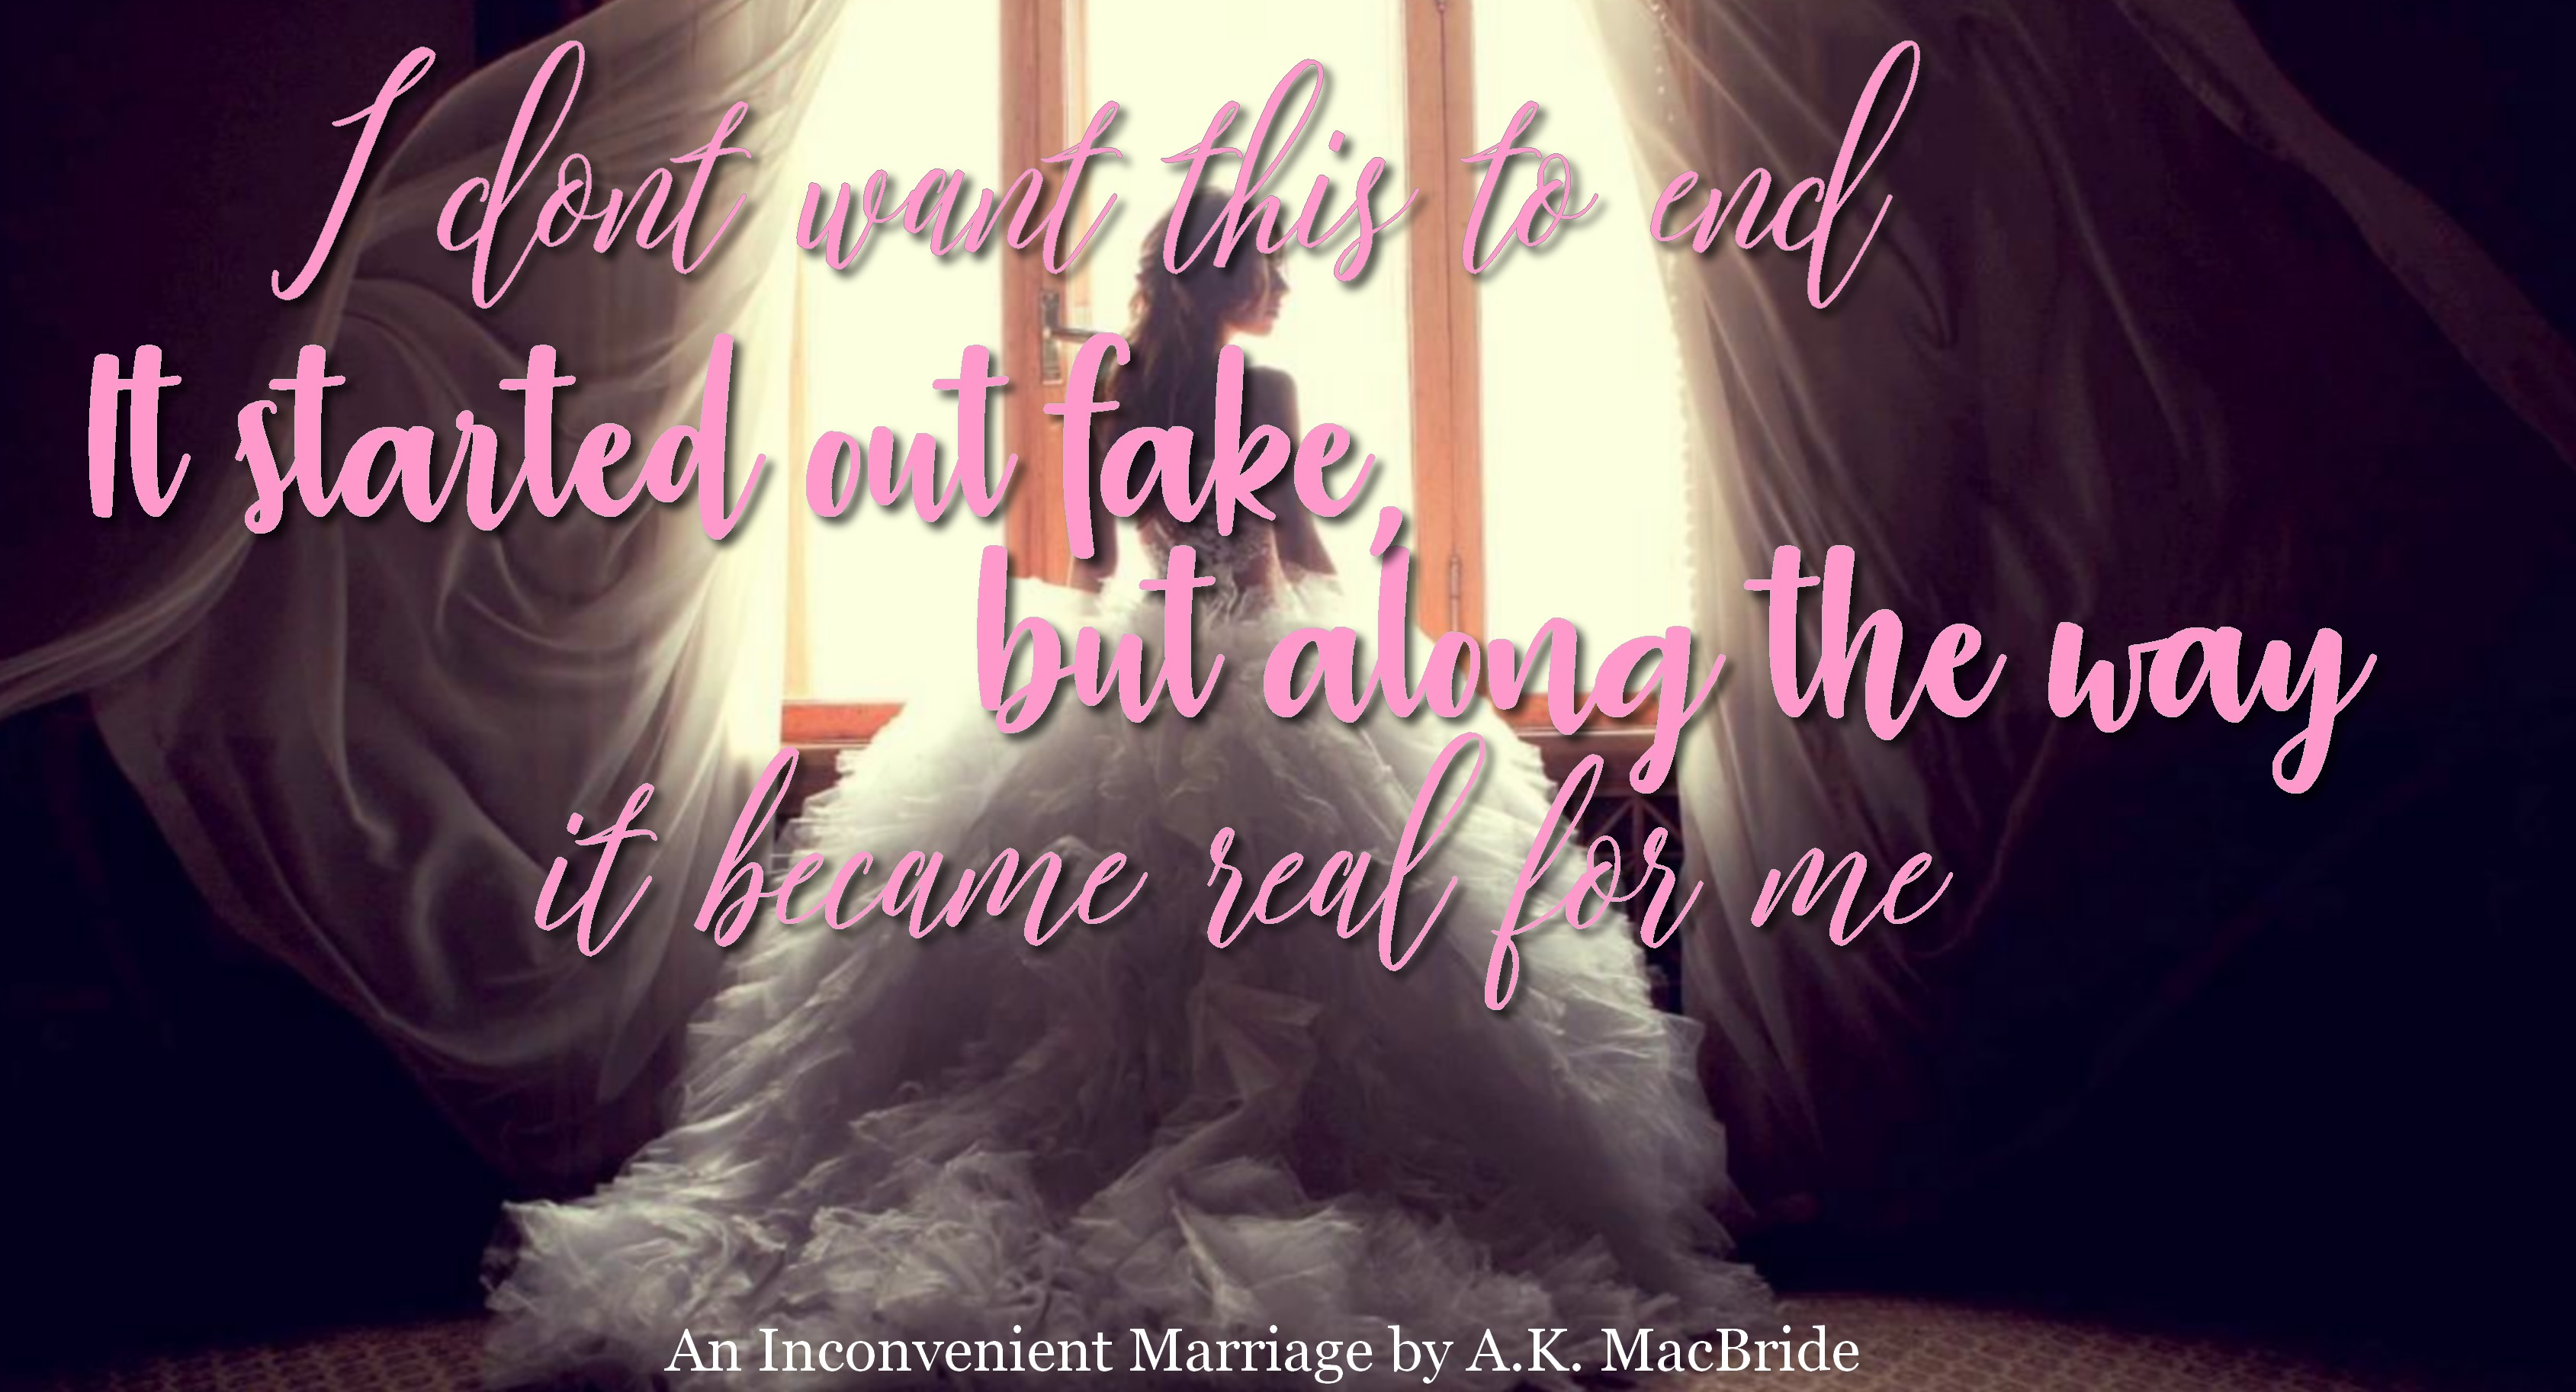 aninconvenientmarriage2